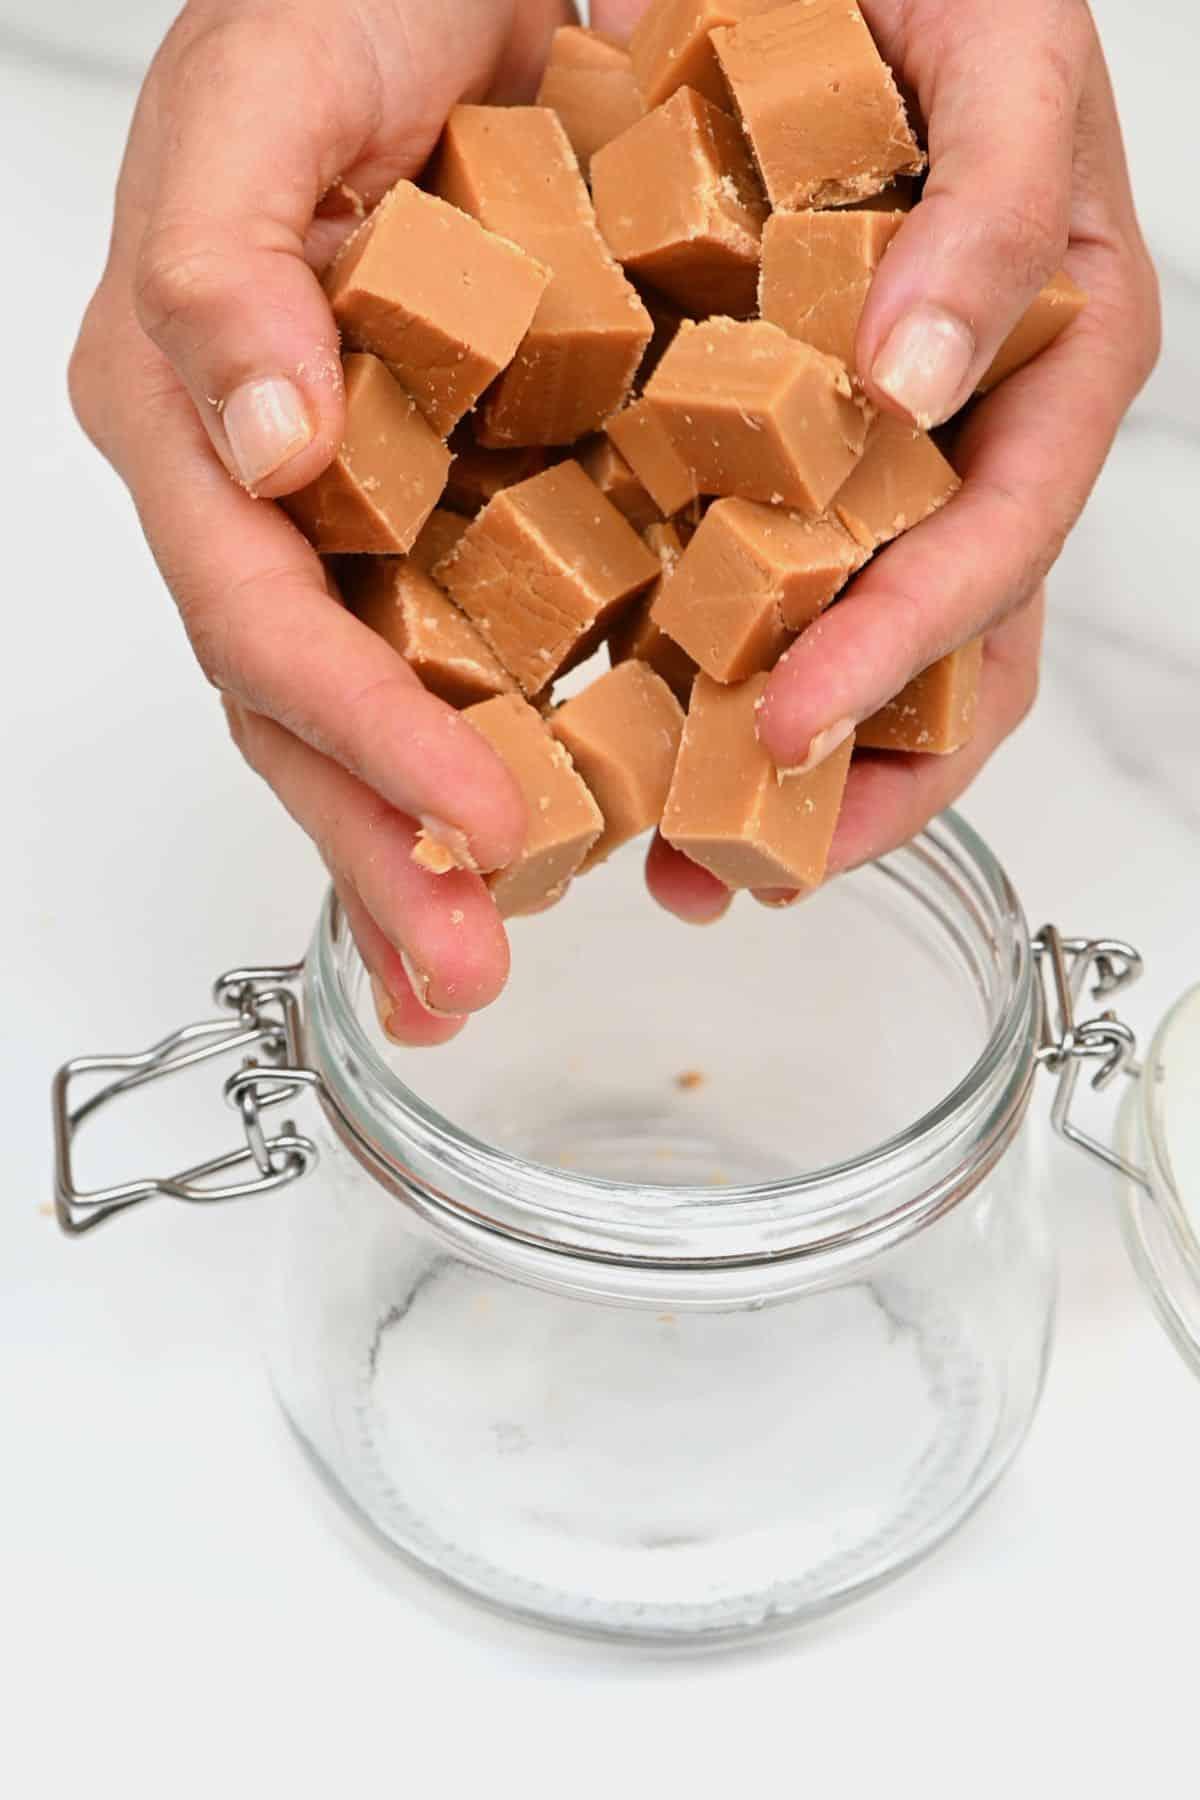 Placing homemade fudge cubes in a jar